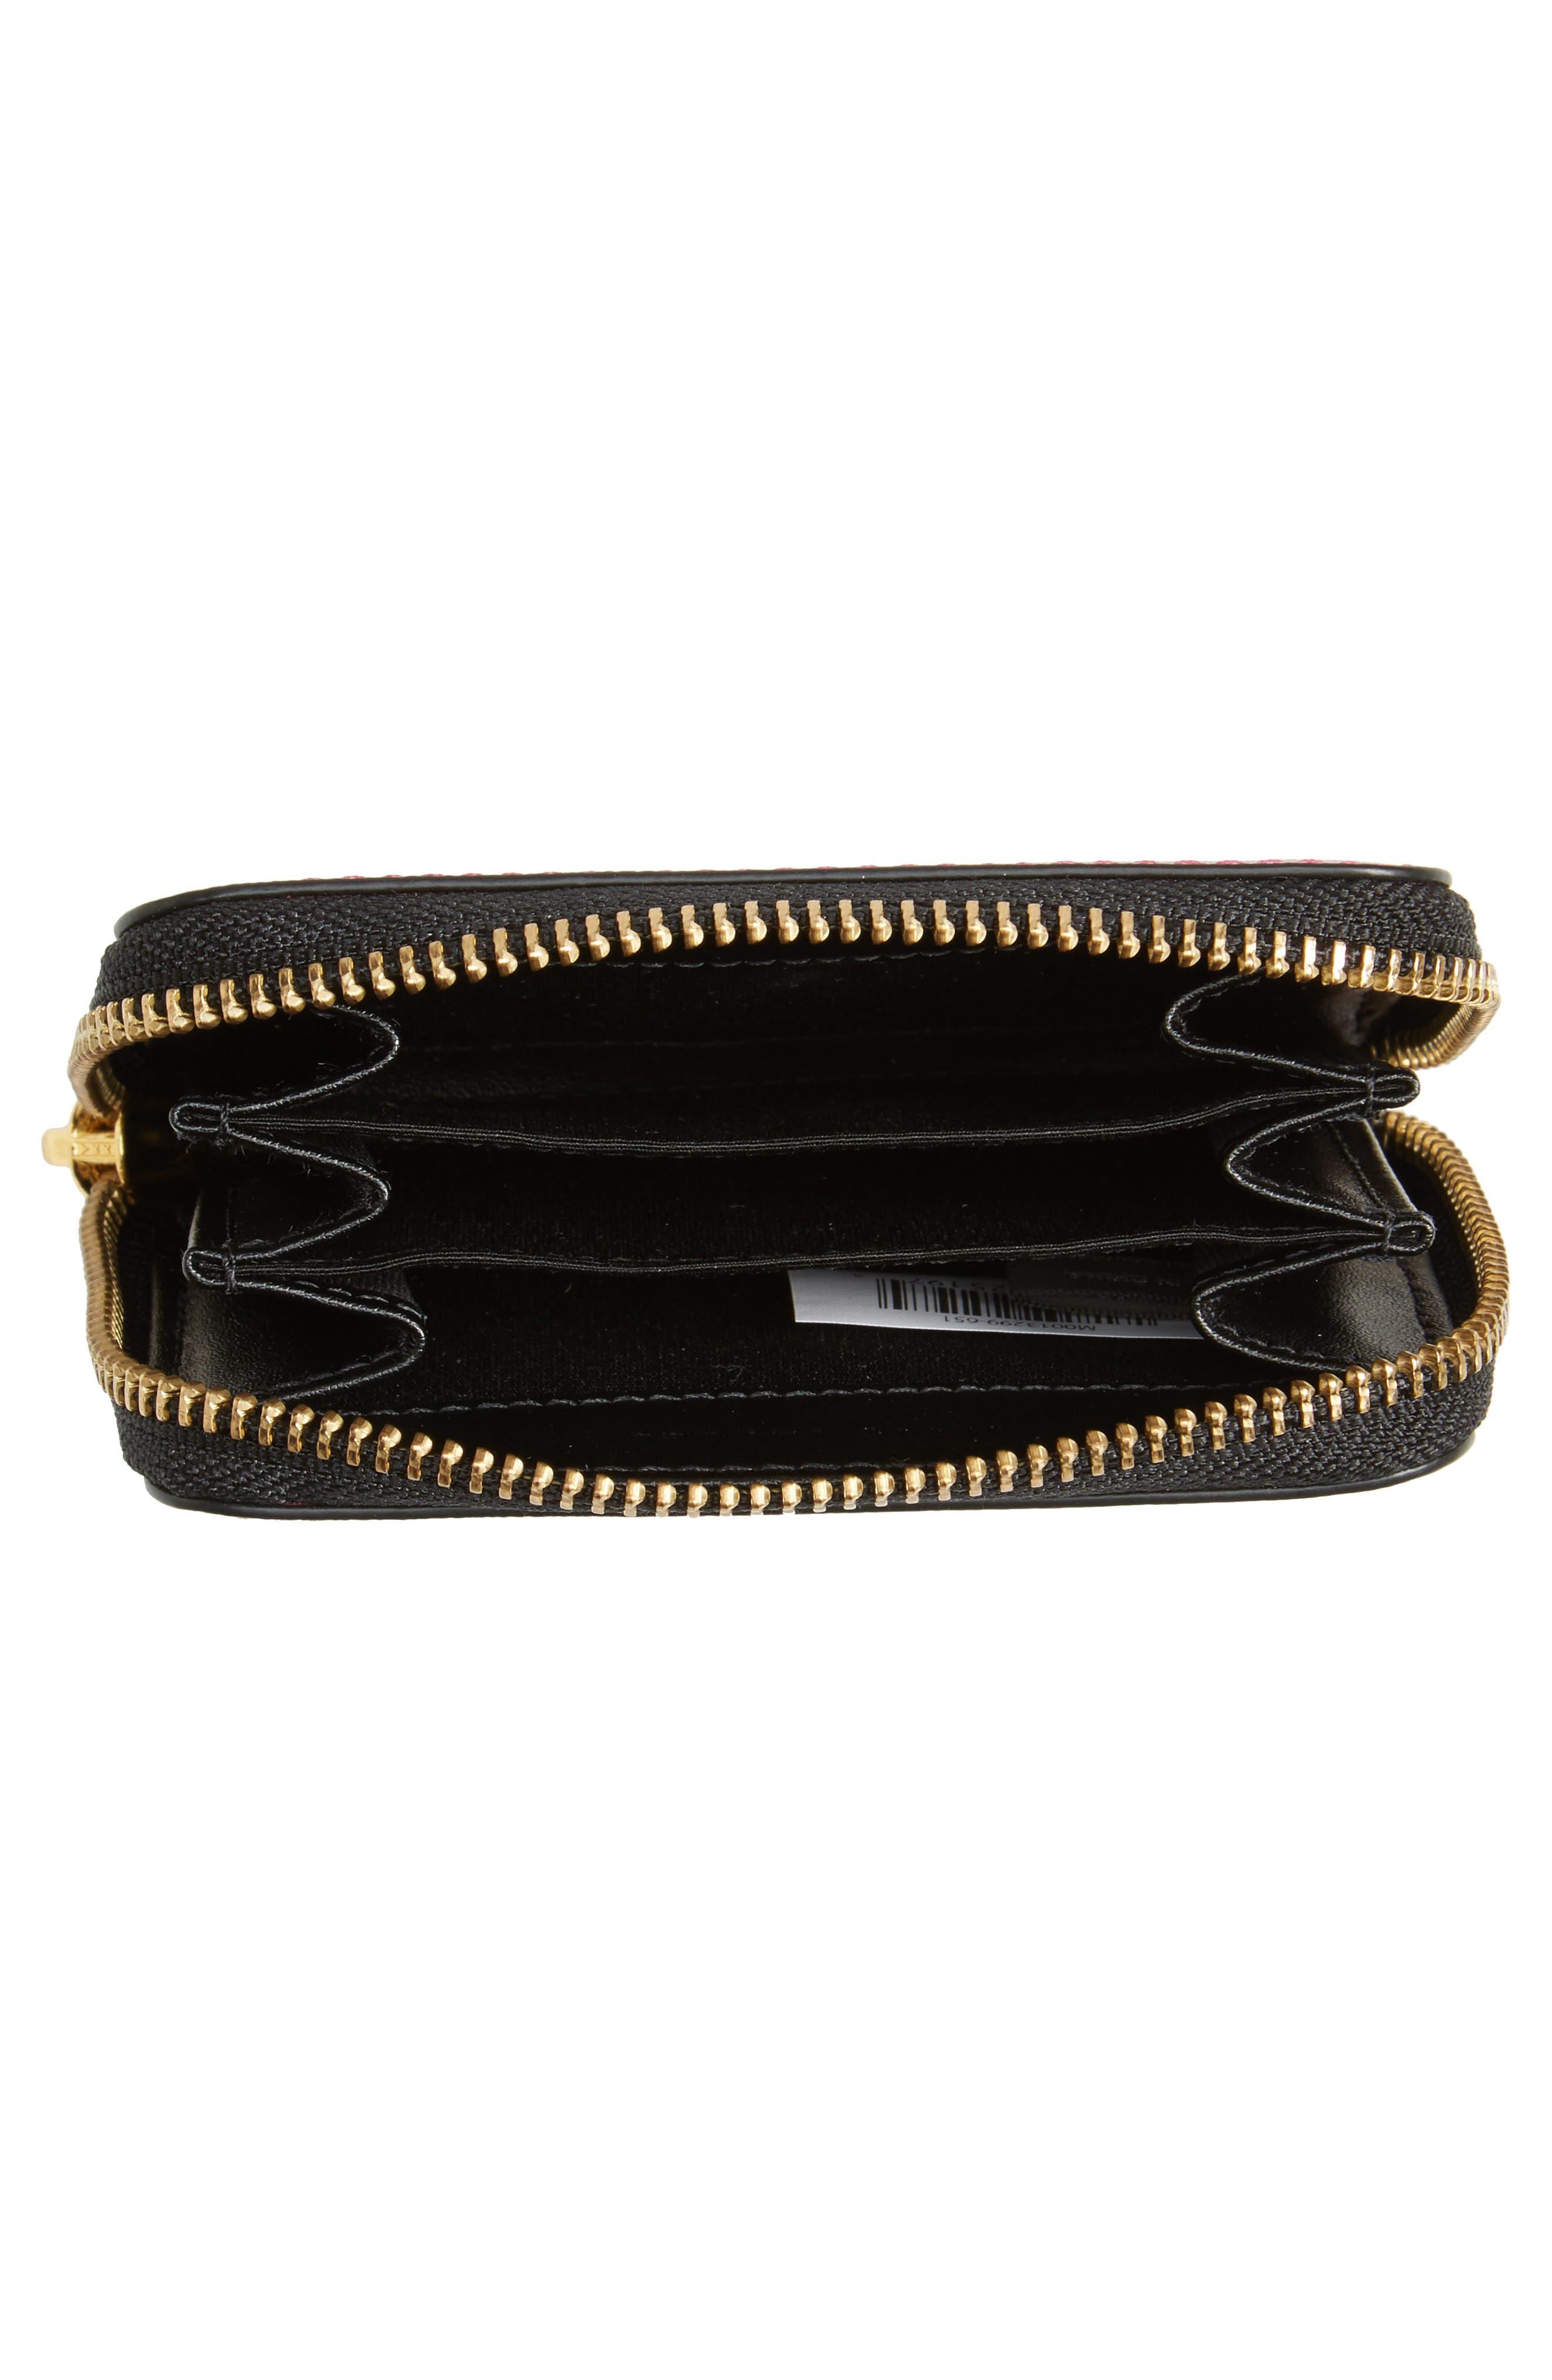 Alternate Image 2  - MARC JACOBS Snapshot Saffiano Leather Zip Around Wallet